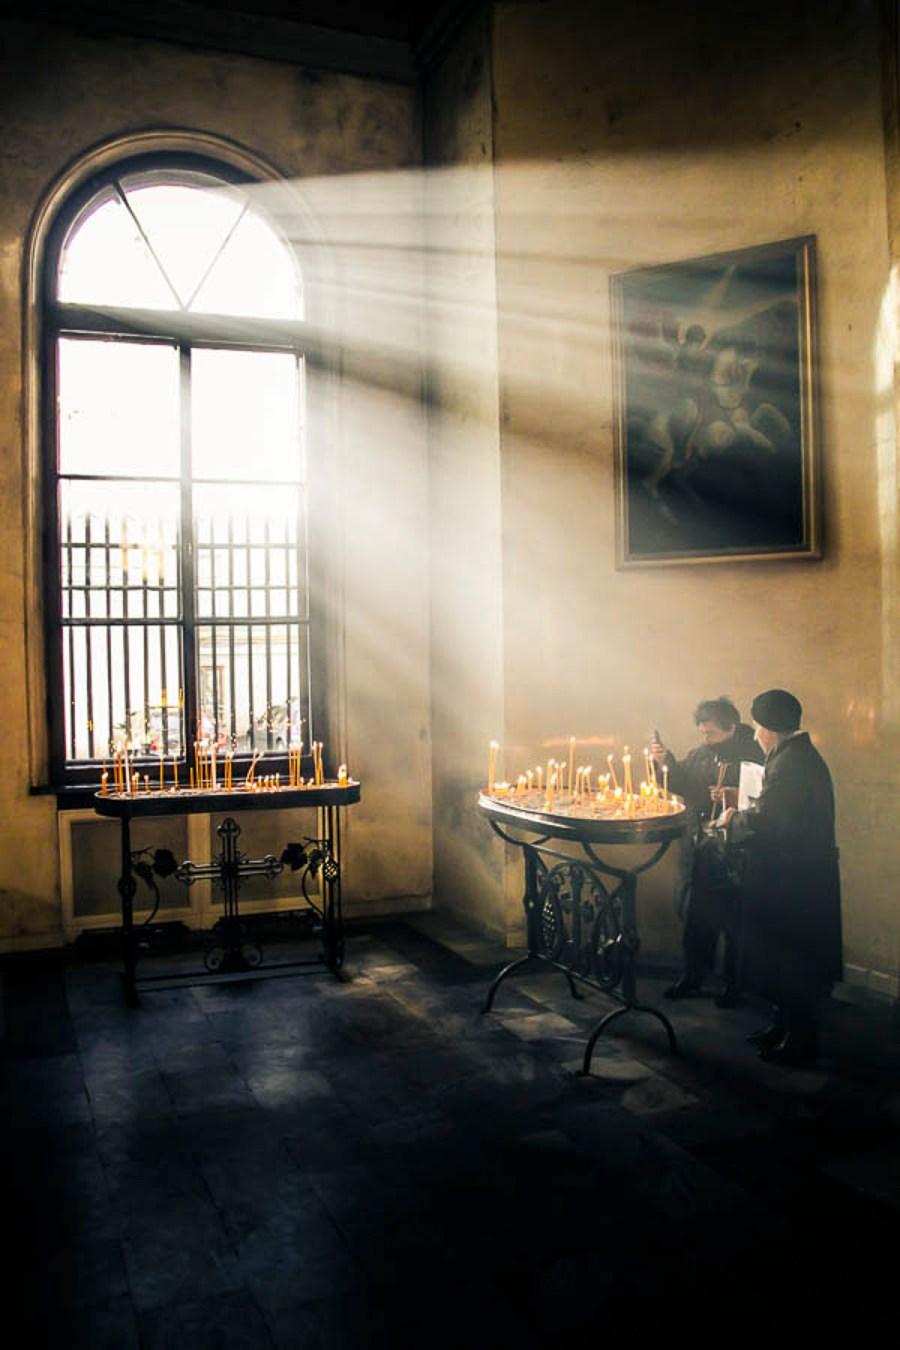 faith by jacques szymanski